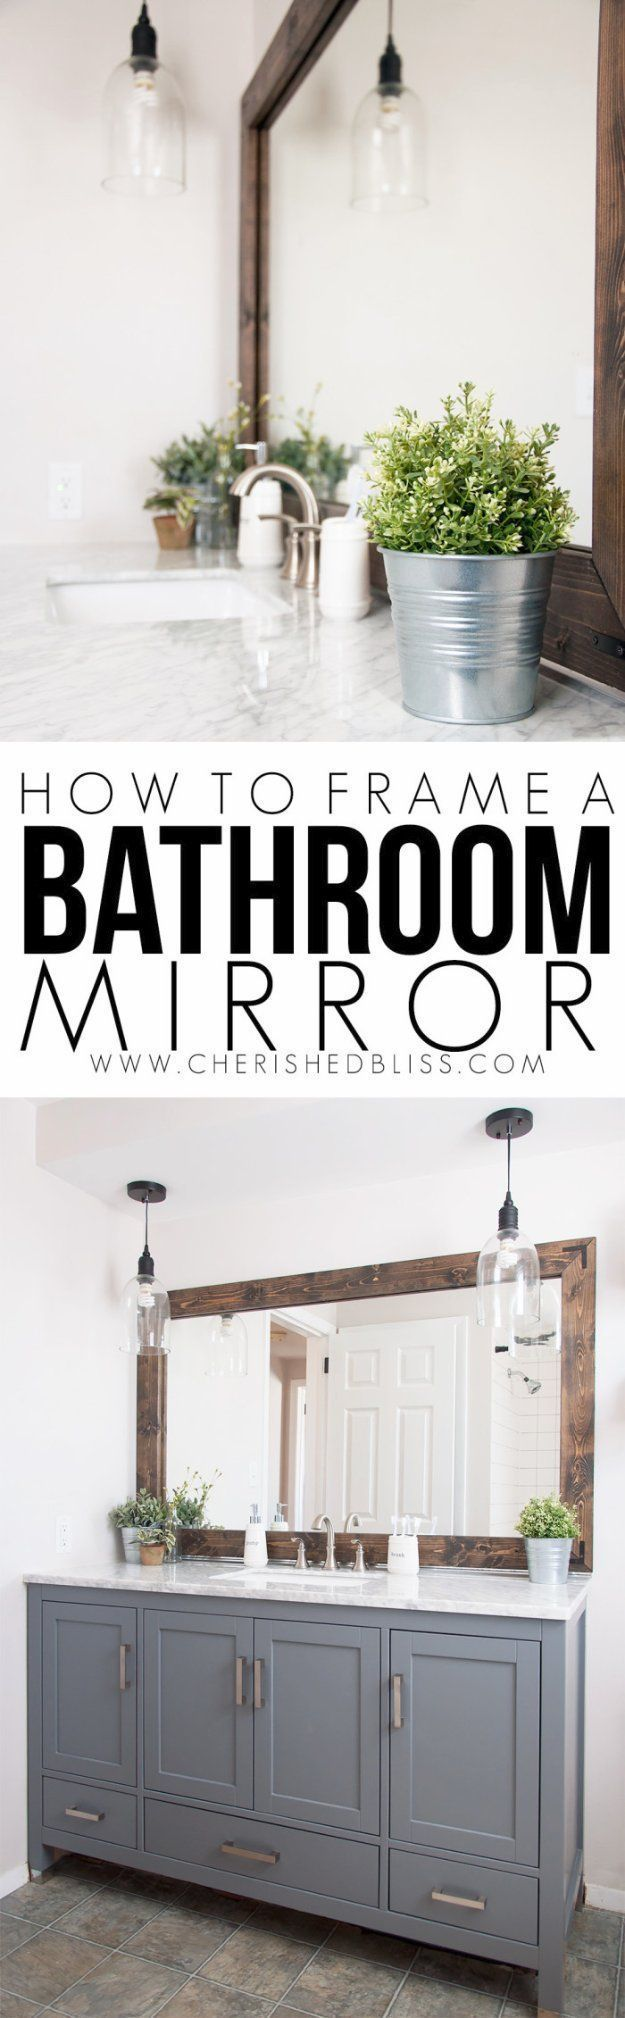 Diy Badezimmer Dekor Ideen Holzrahmen Badezimmerspiegel Tutorial